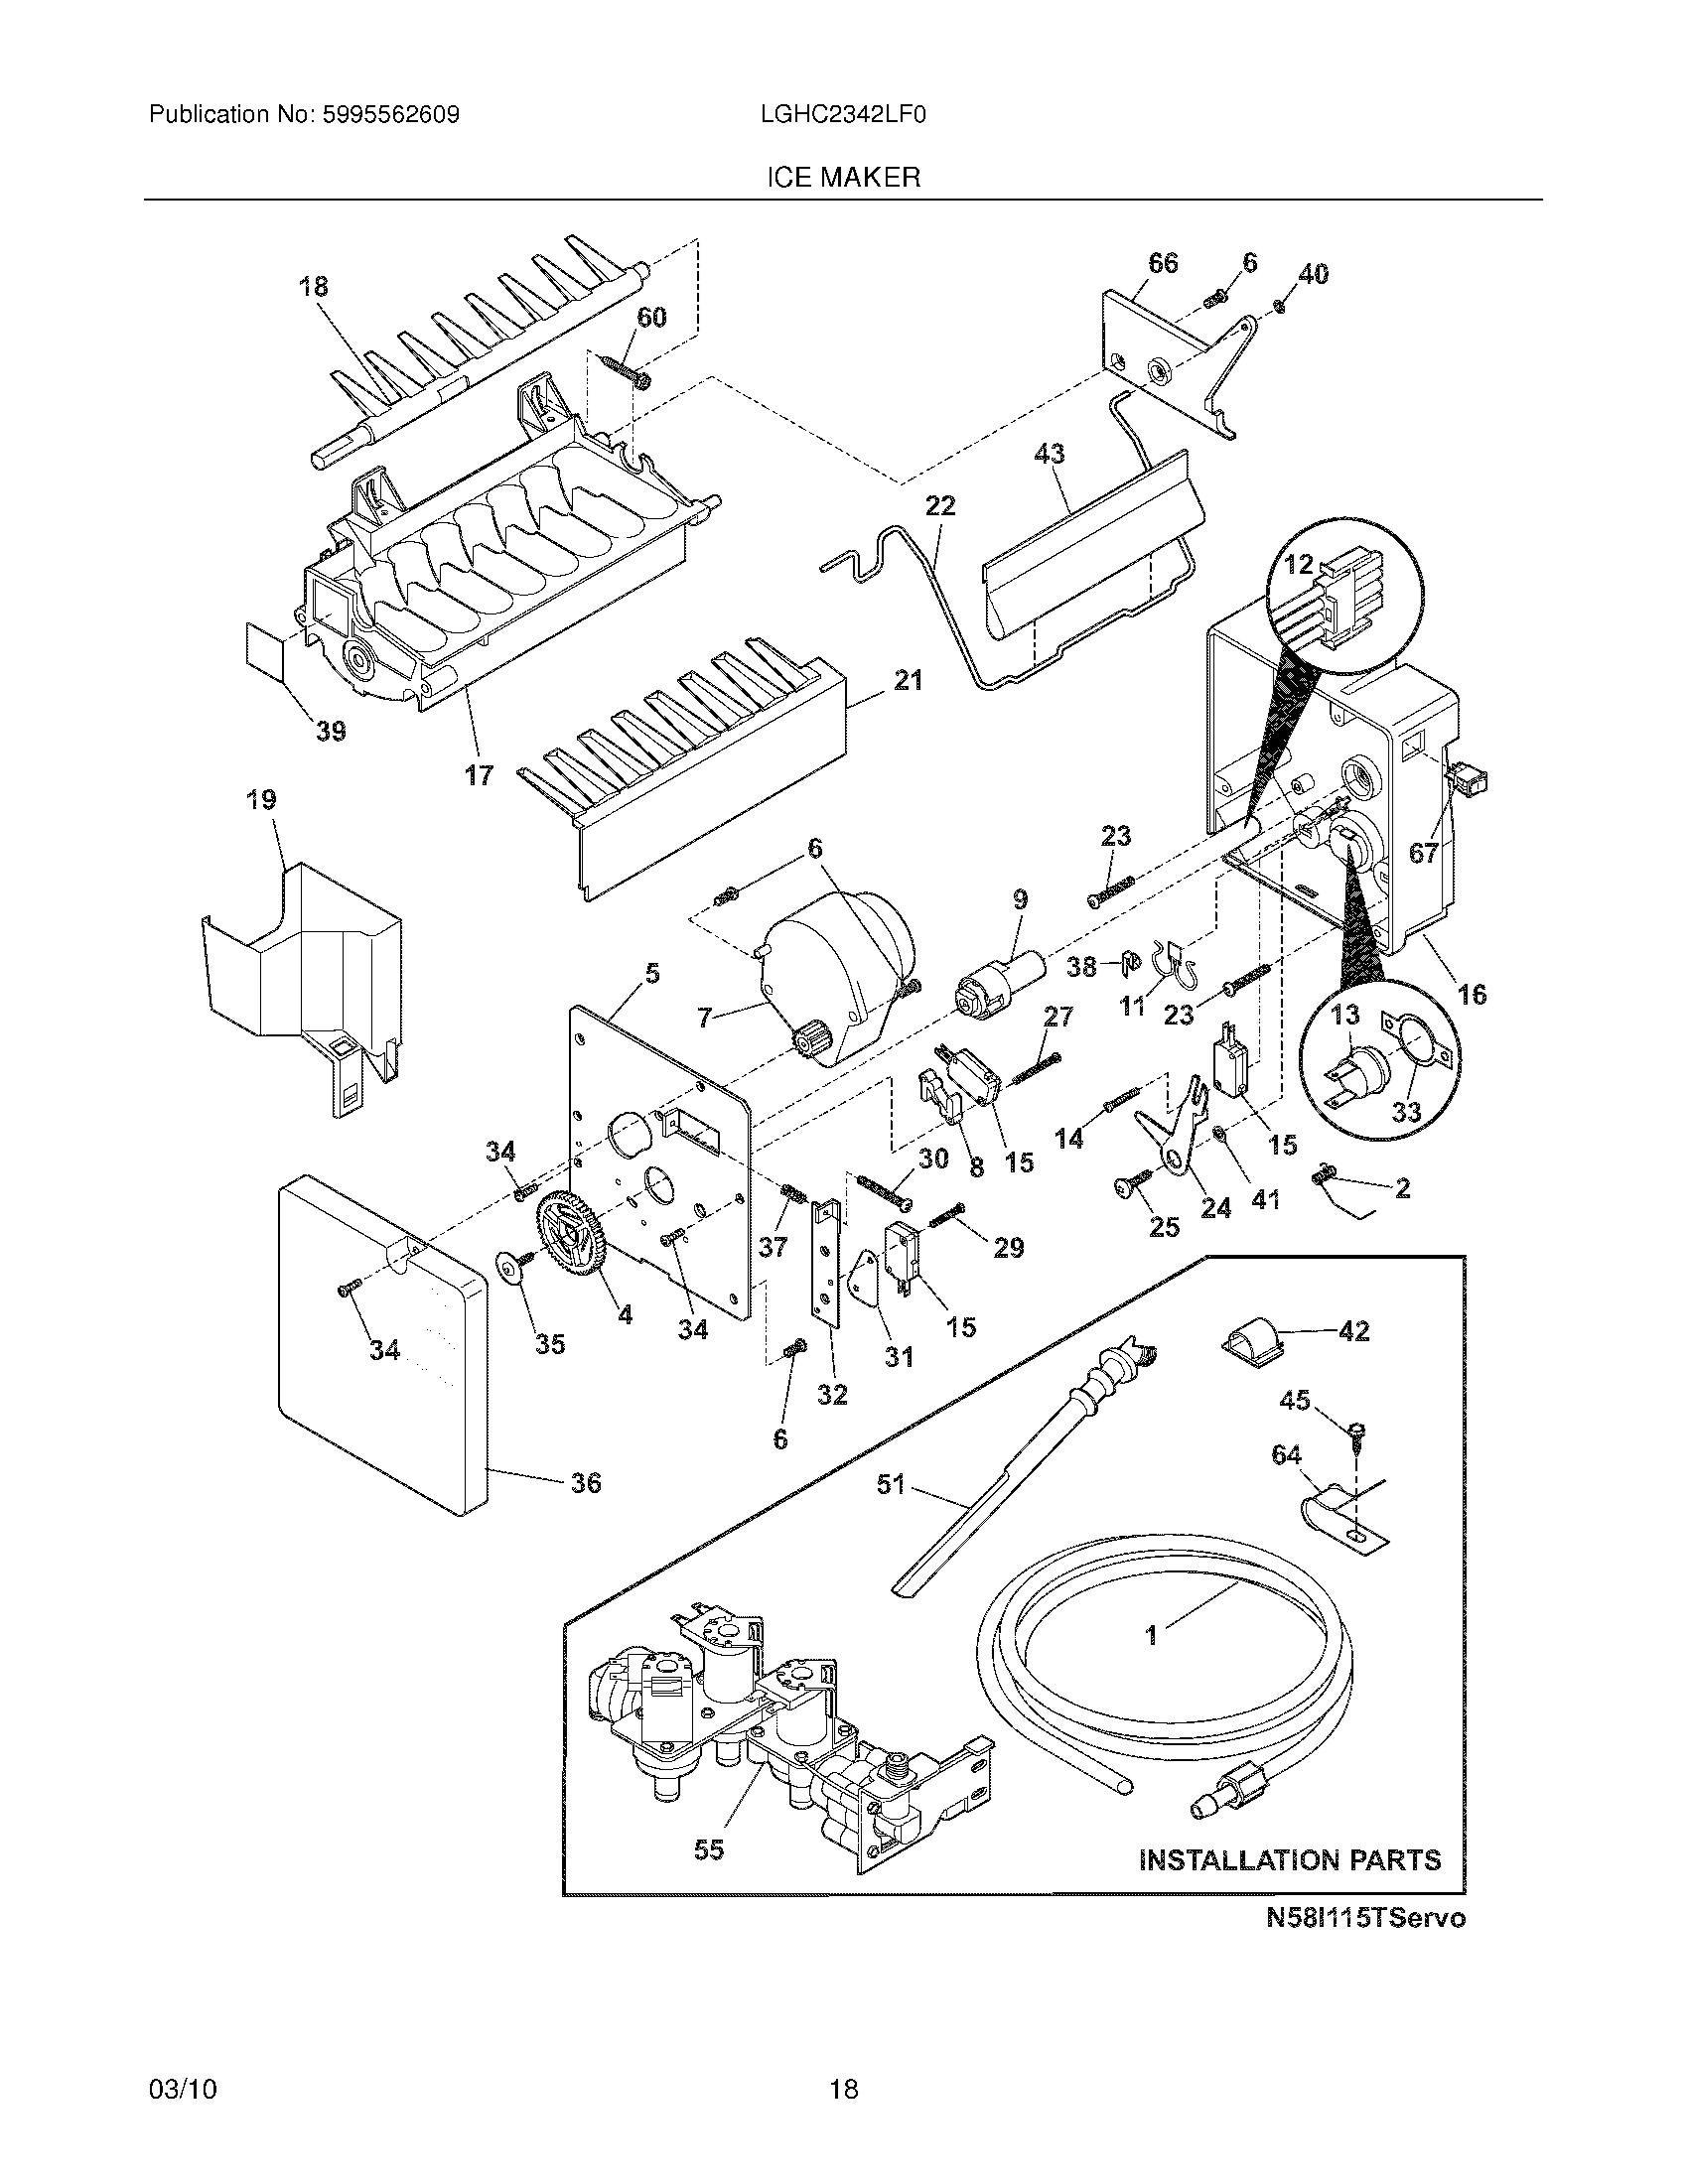 ElectroluxImg_19000101 20150717_00134104?width\=1000 2000 saturn ls2 wiring diagram 2000 saturn ls1 radio wiring,Honda Xr250 Wiring Diagram